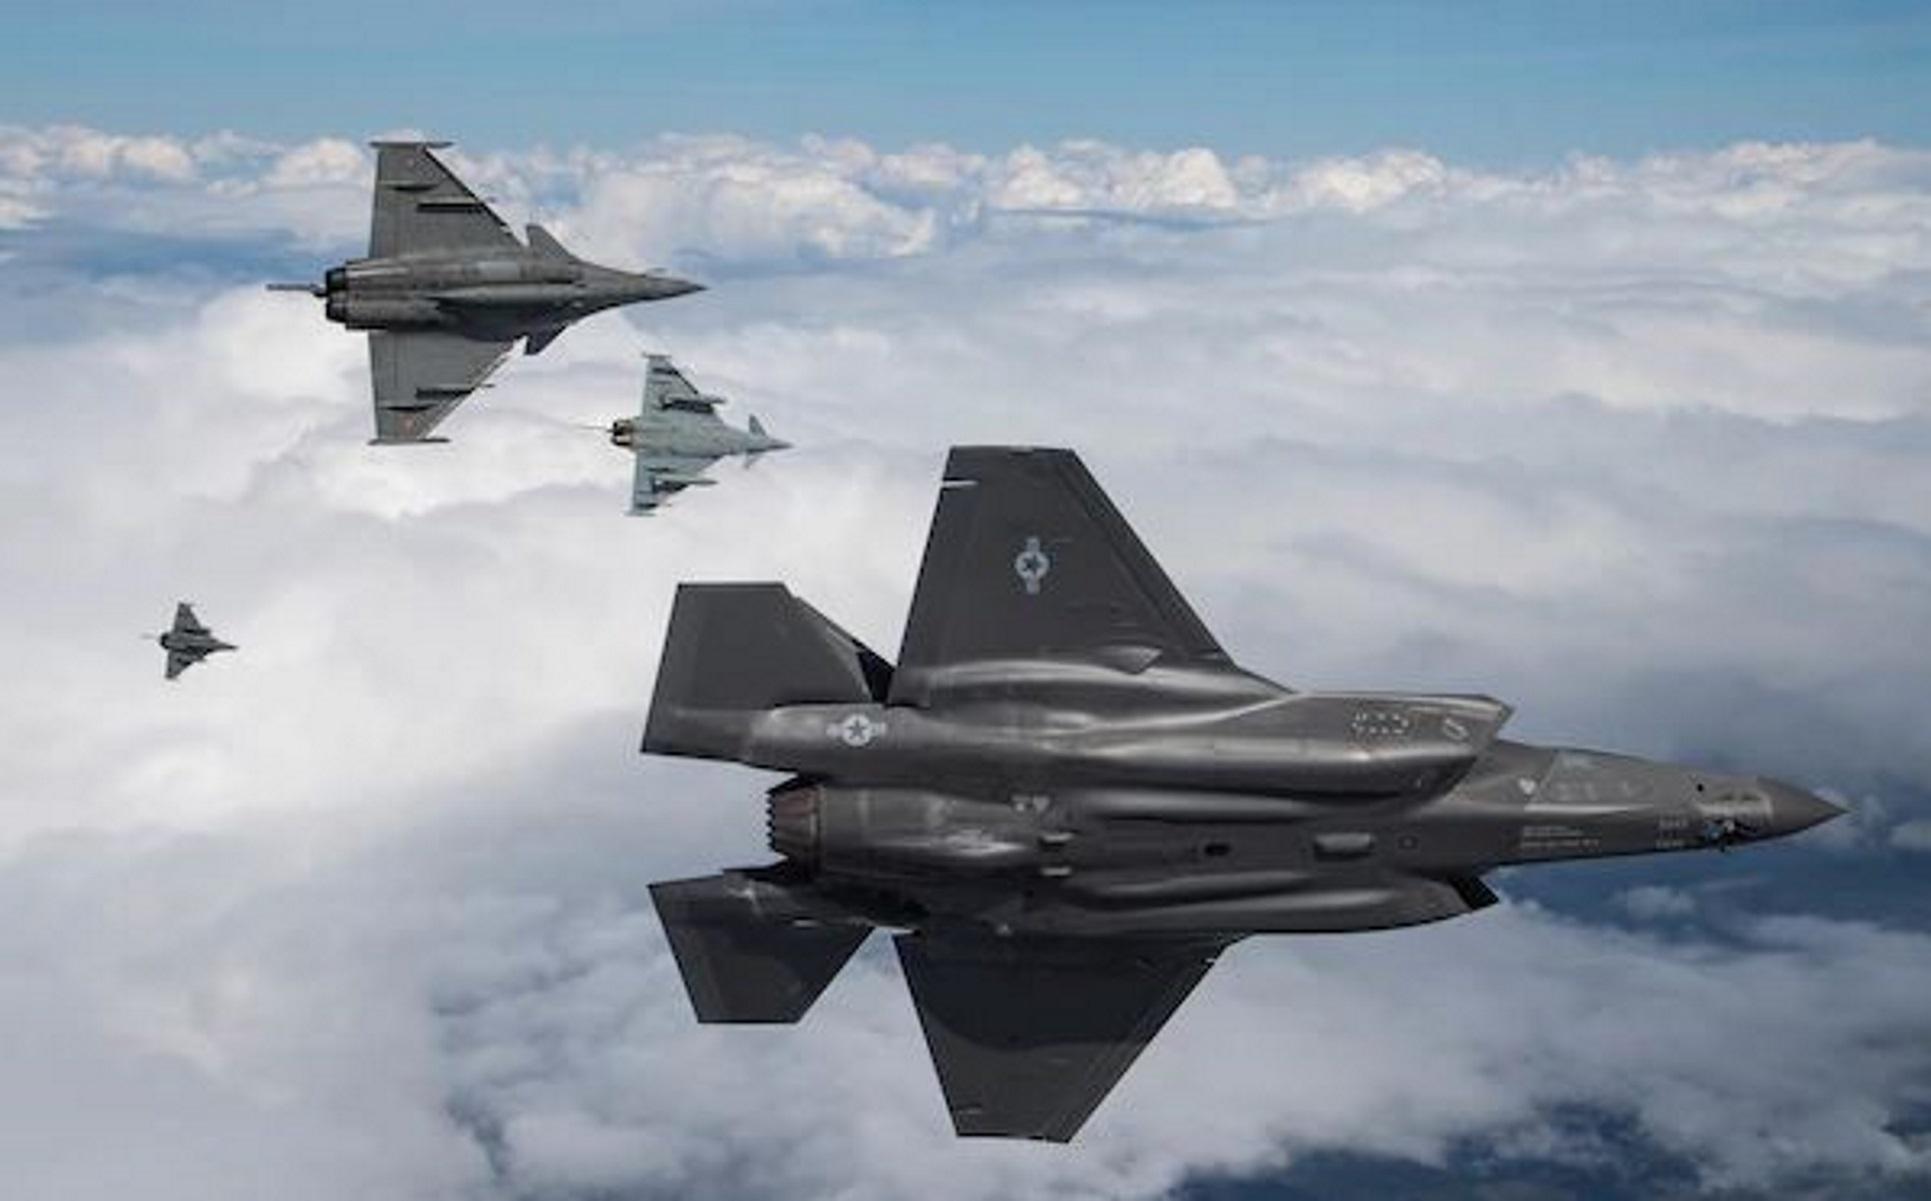 F-35 στην Ελλάδα: Αύριο το «πρώτο βήμα» για το νομοσχέδιο αμυντικής συνεργασίας με ΗΠΑ